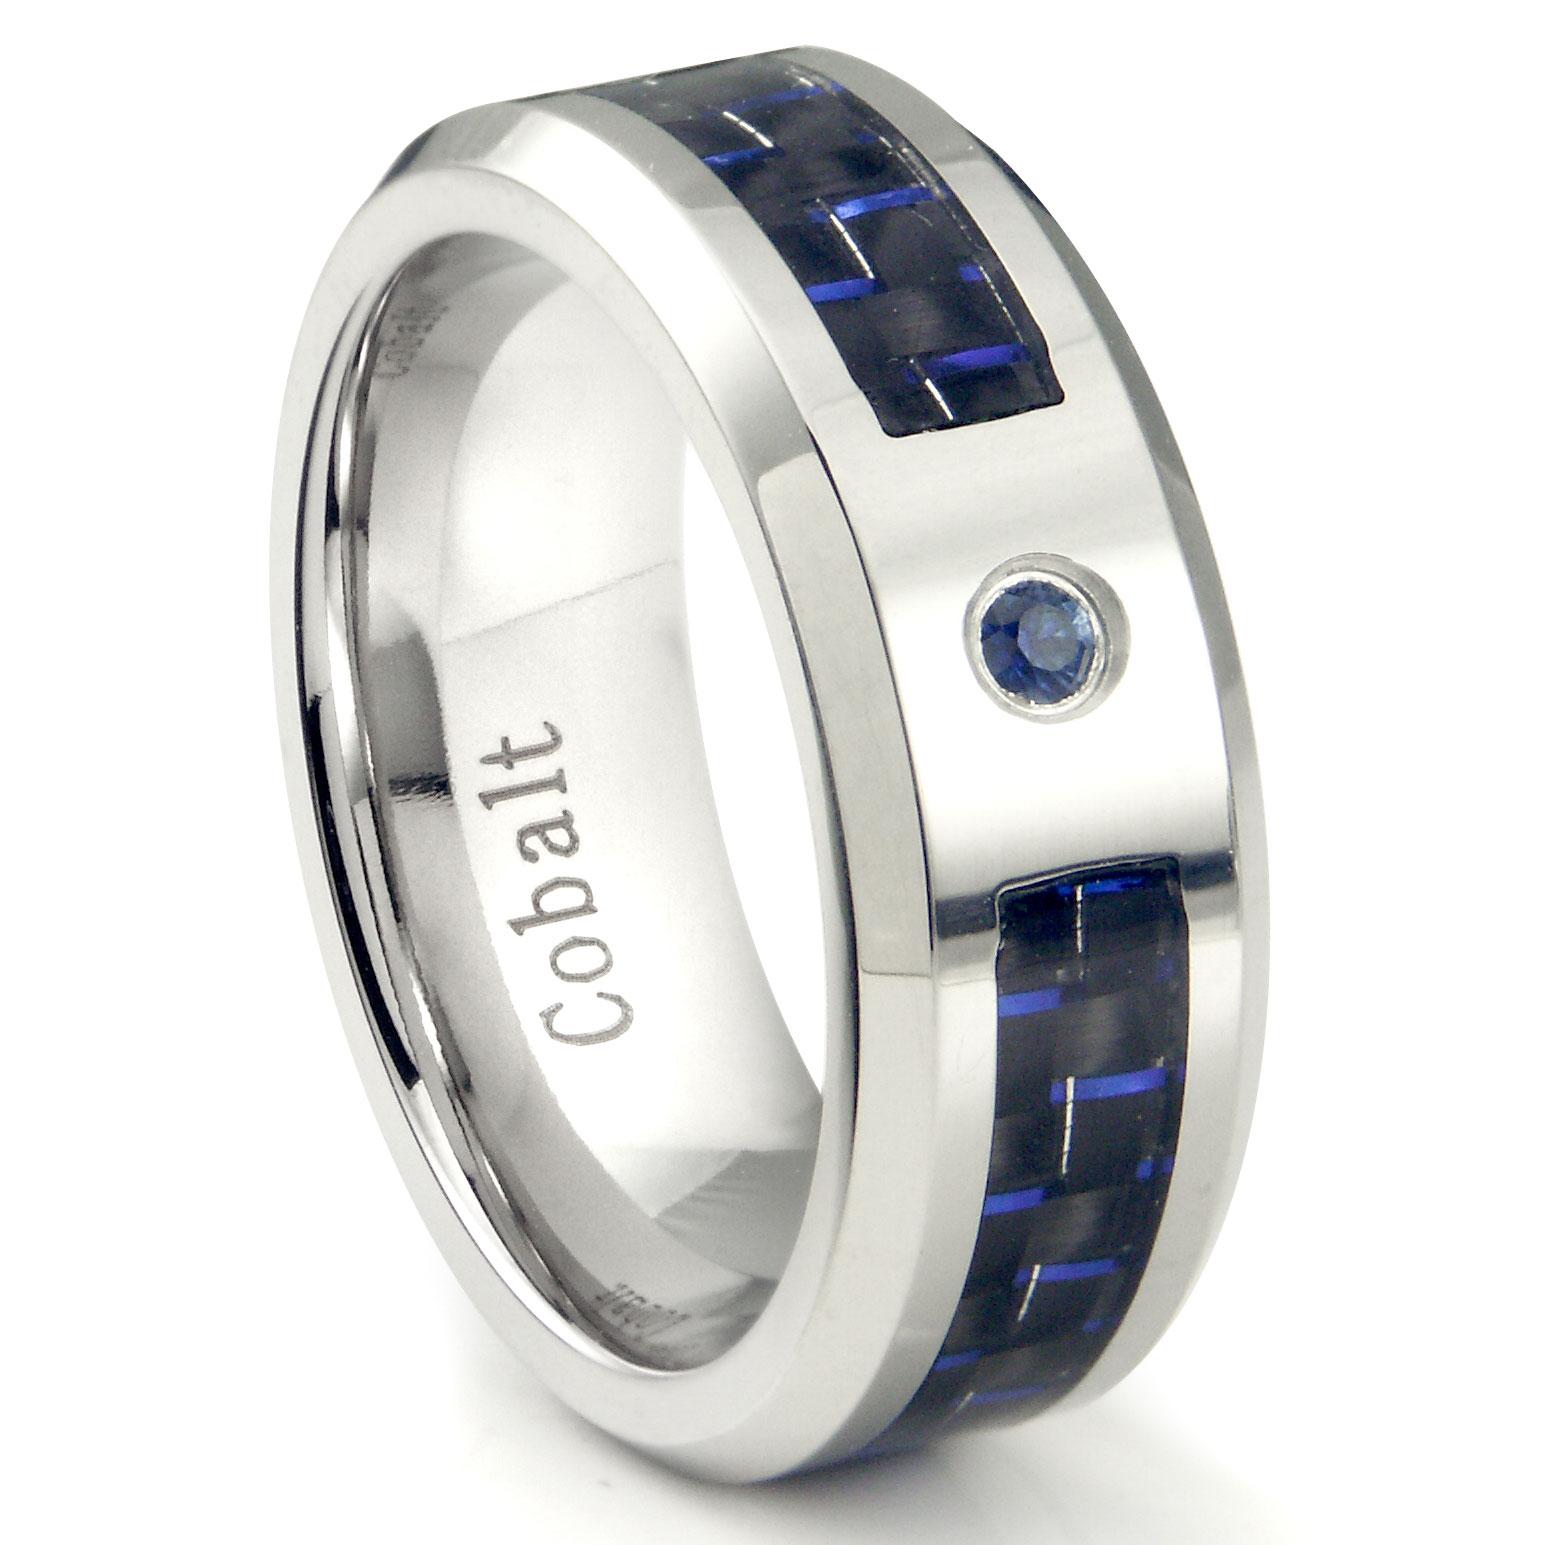 Cobalt Chrome 8MM Blue Sapphire Blue Carbon Fiber Inlay Wedding Band Ring P sapphire wedding bands Loading zoom